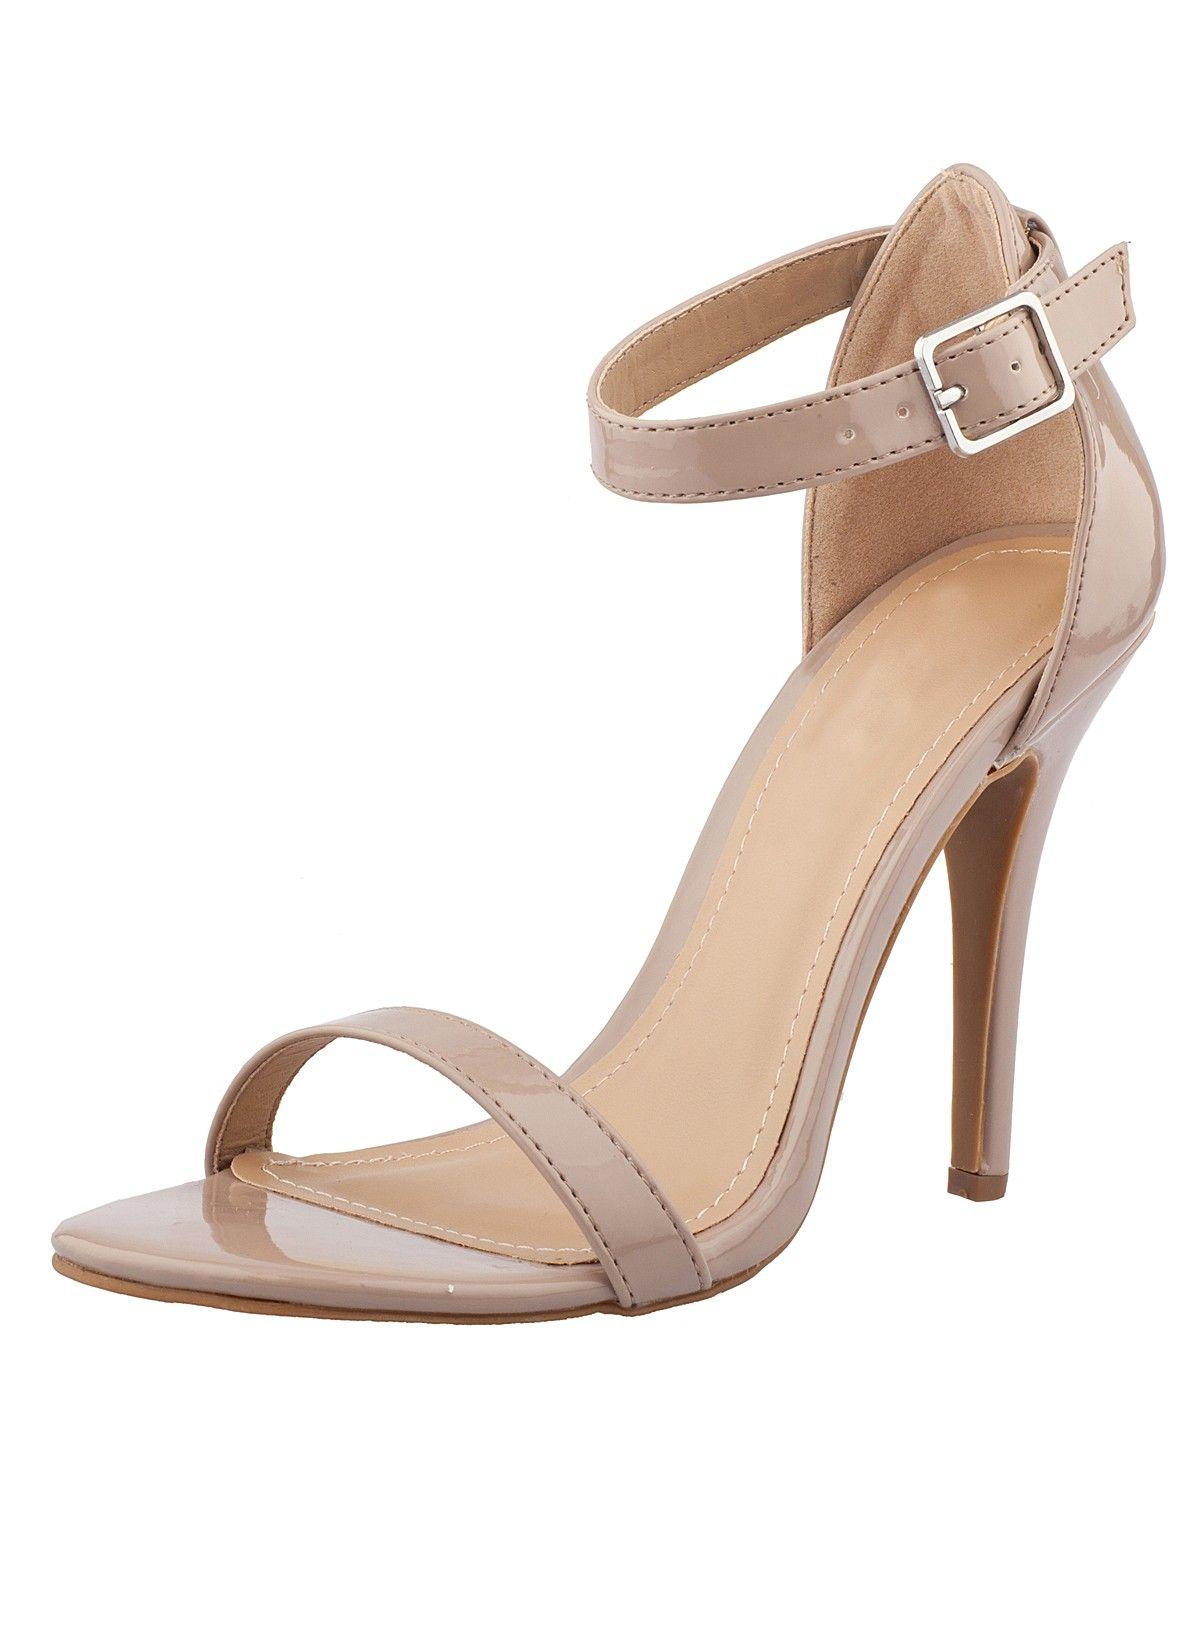 a4b707ef9c09 Shop Prima Donna - Sambista Ankle Strap Heels Nude at Prima donna ...